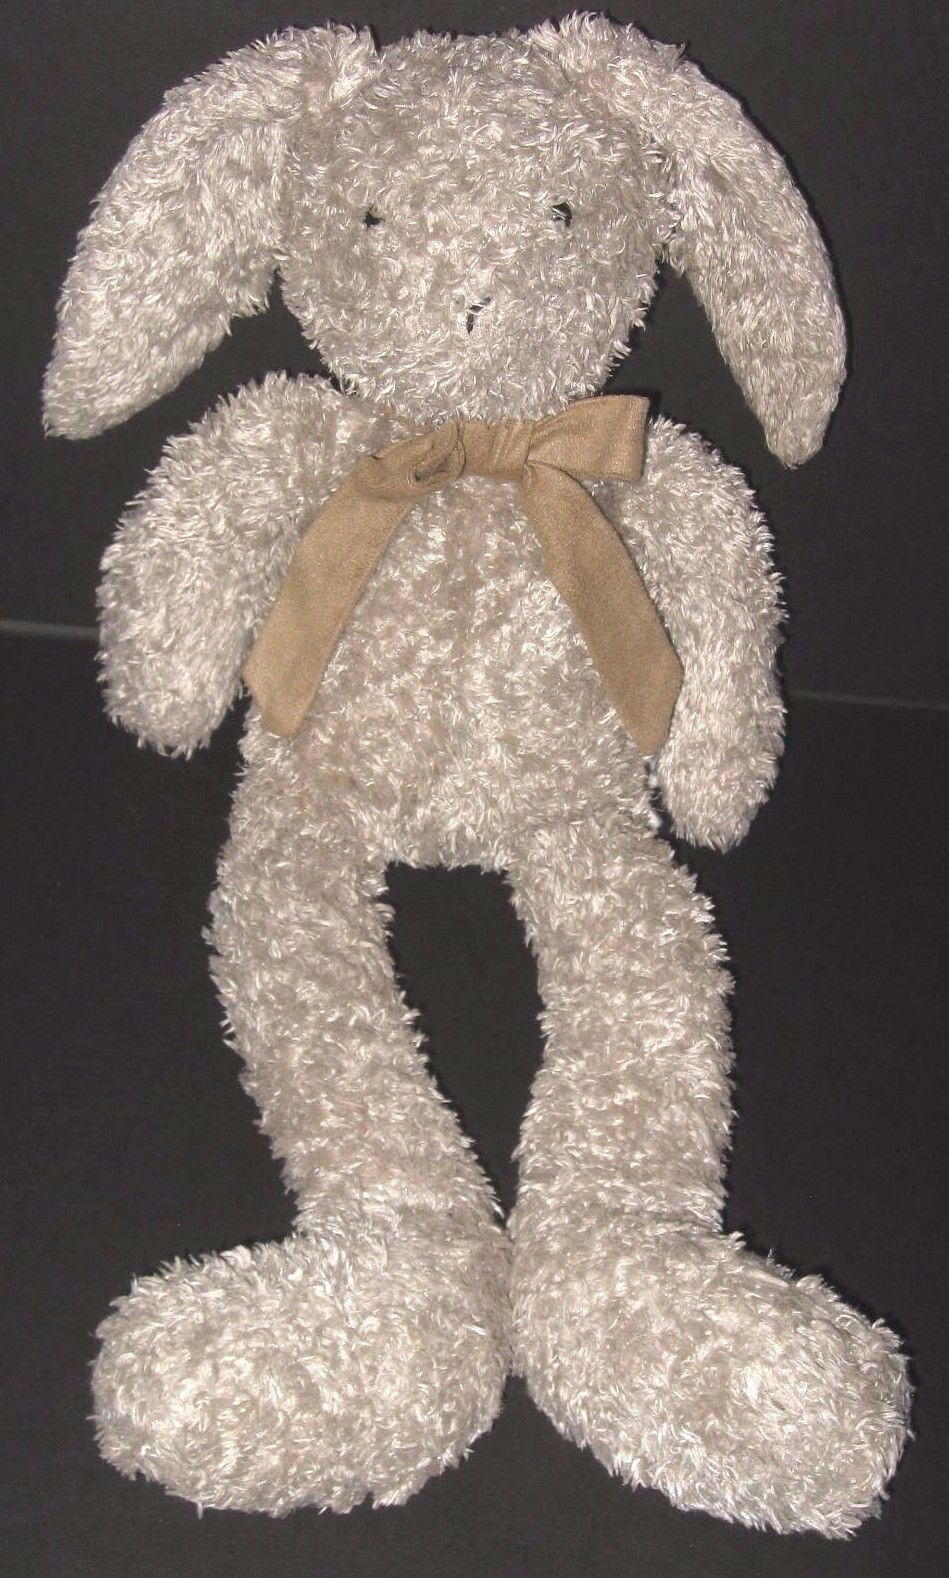 Jellycat Shushky Bunny Rabbit 16  Tan Plush Long Legs Suede Bow Stuffed Animal